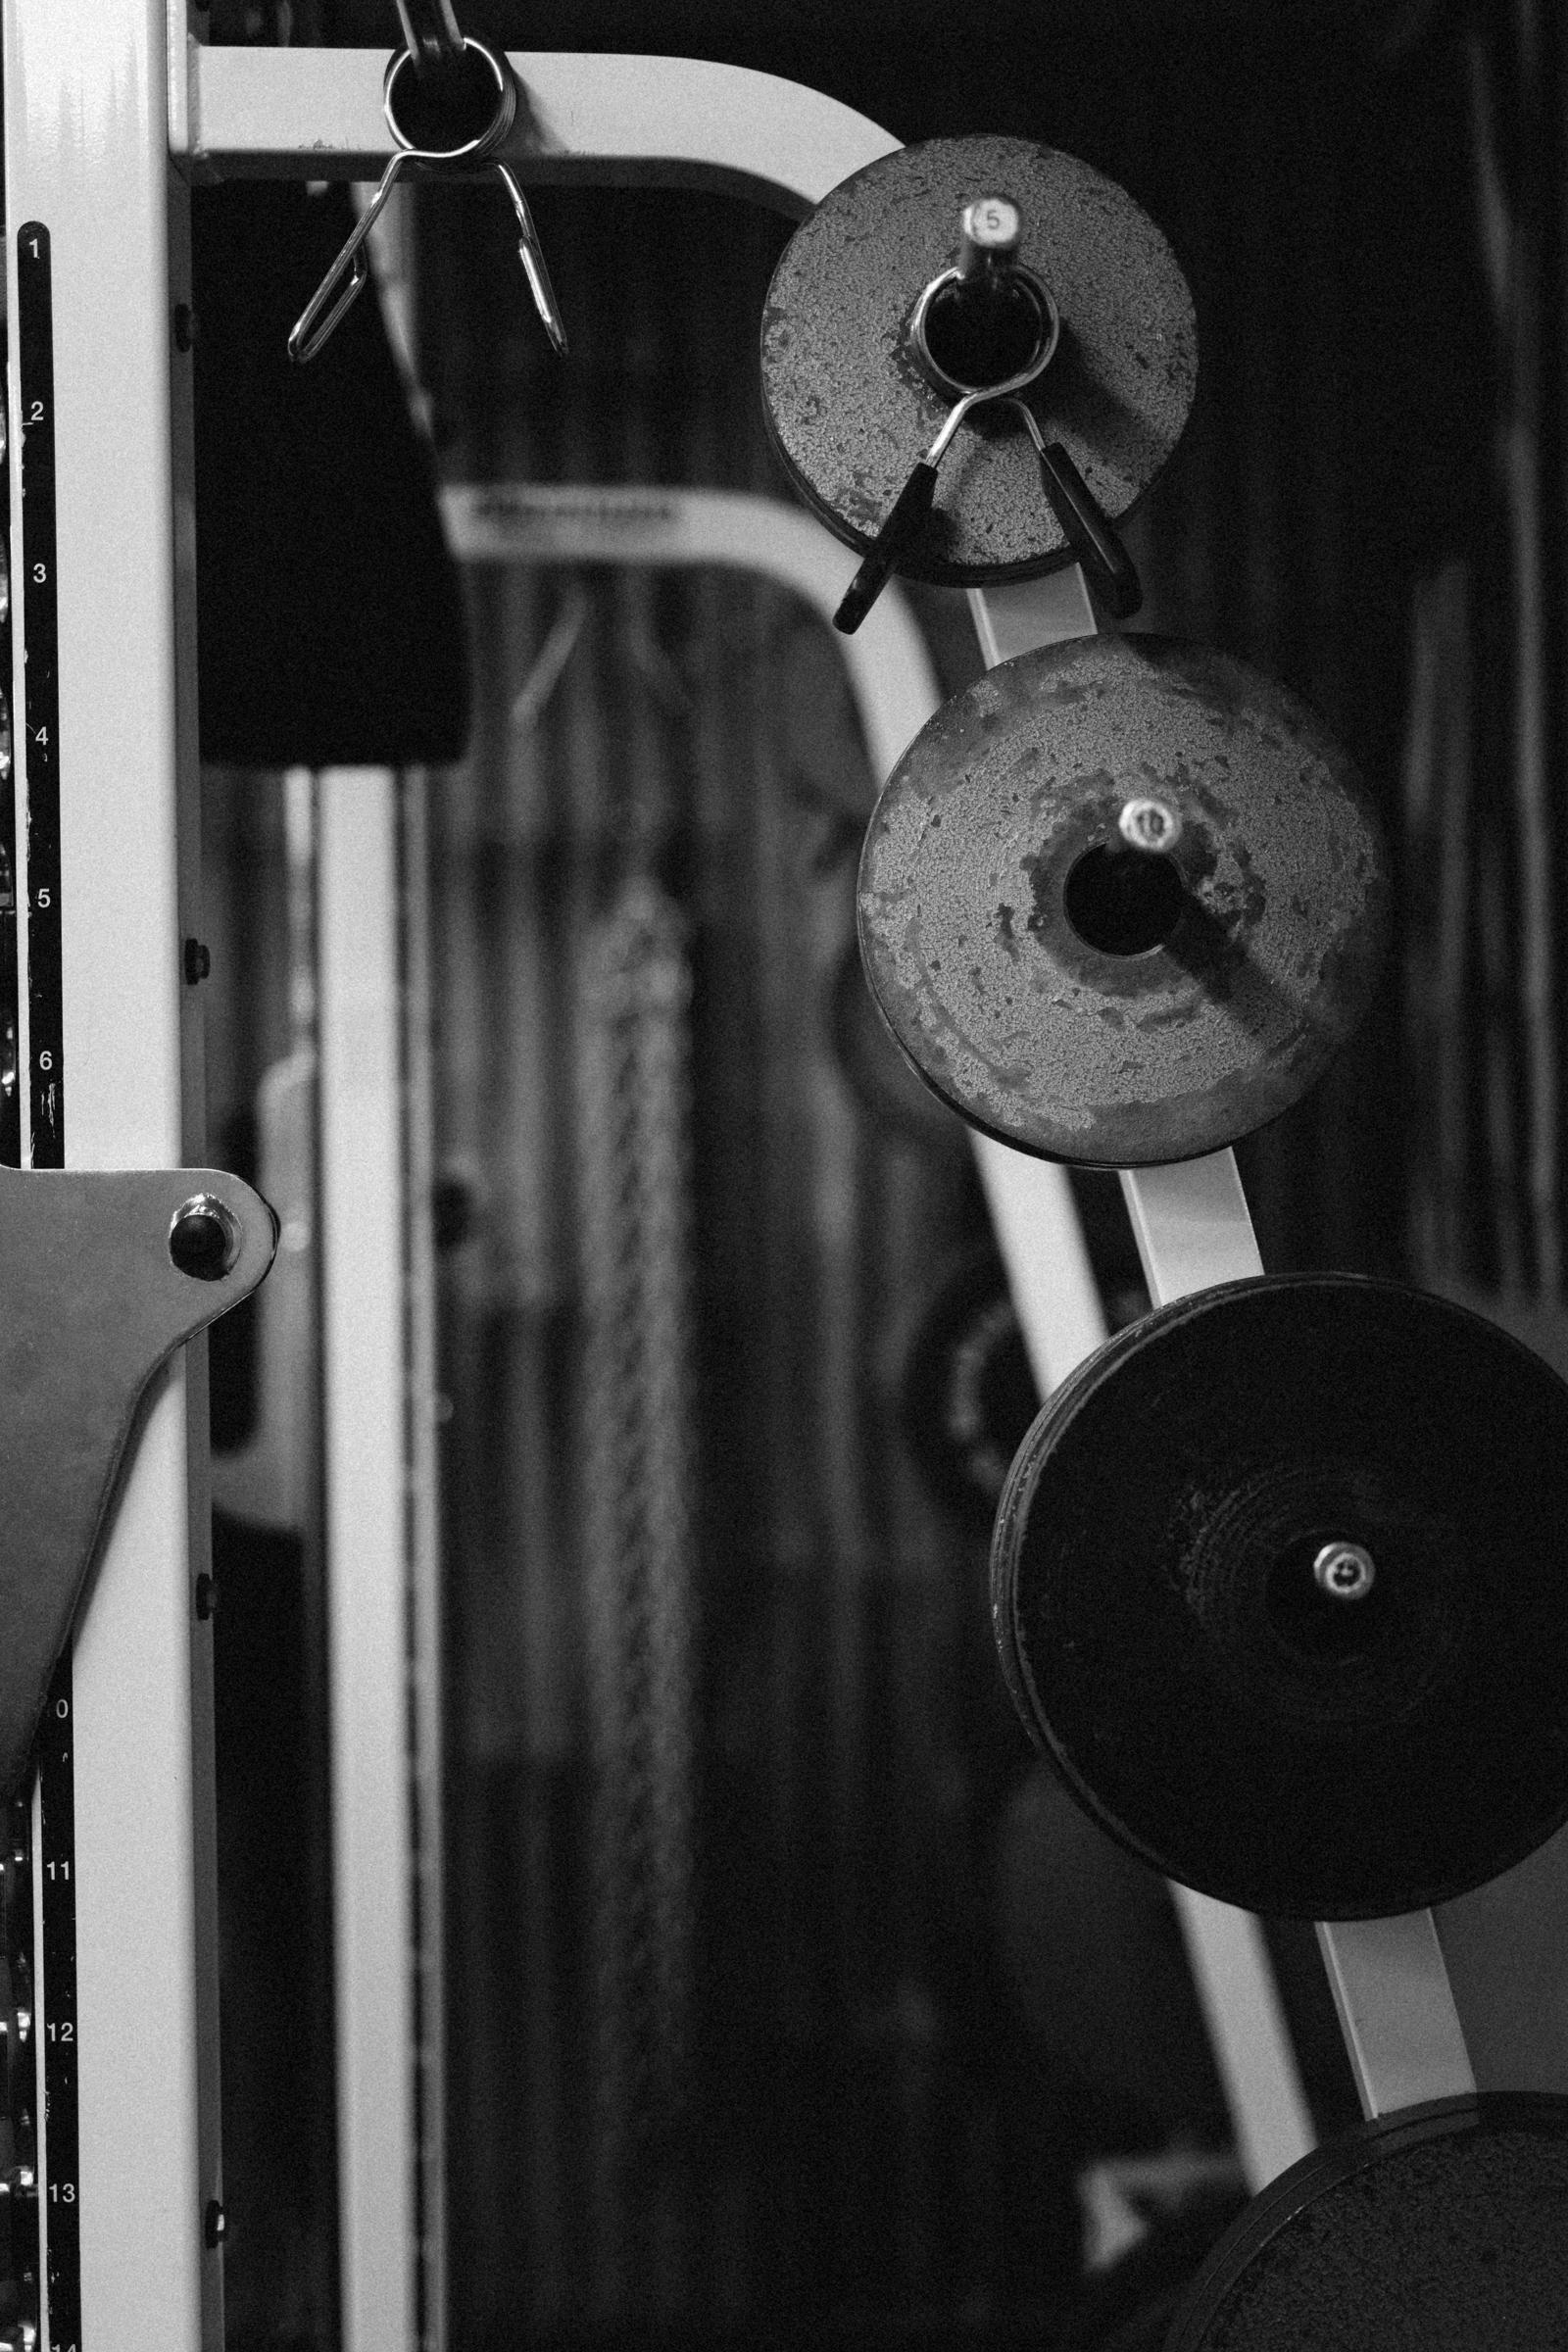 001-Stronger.Version.Fitness.Gym.Shots.18-24.jpg